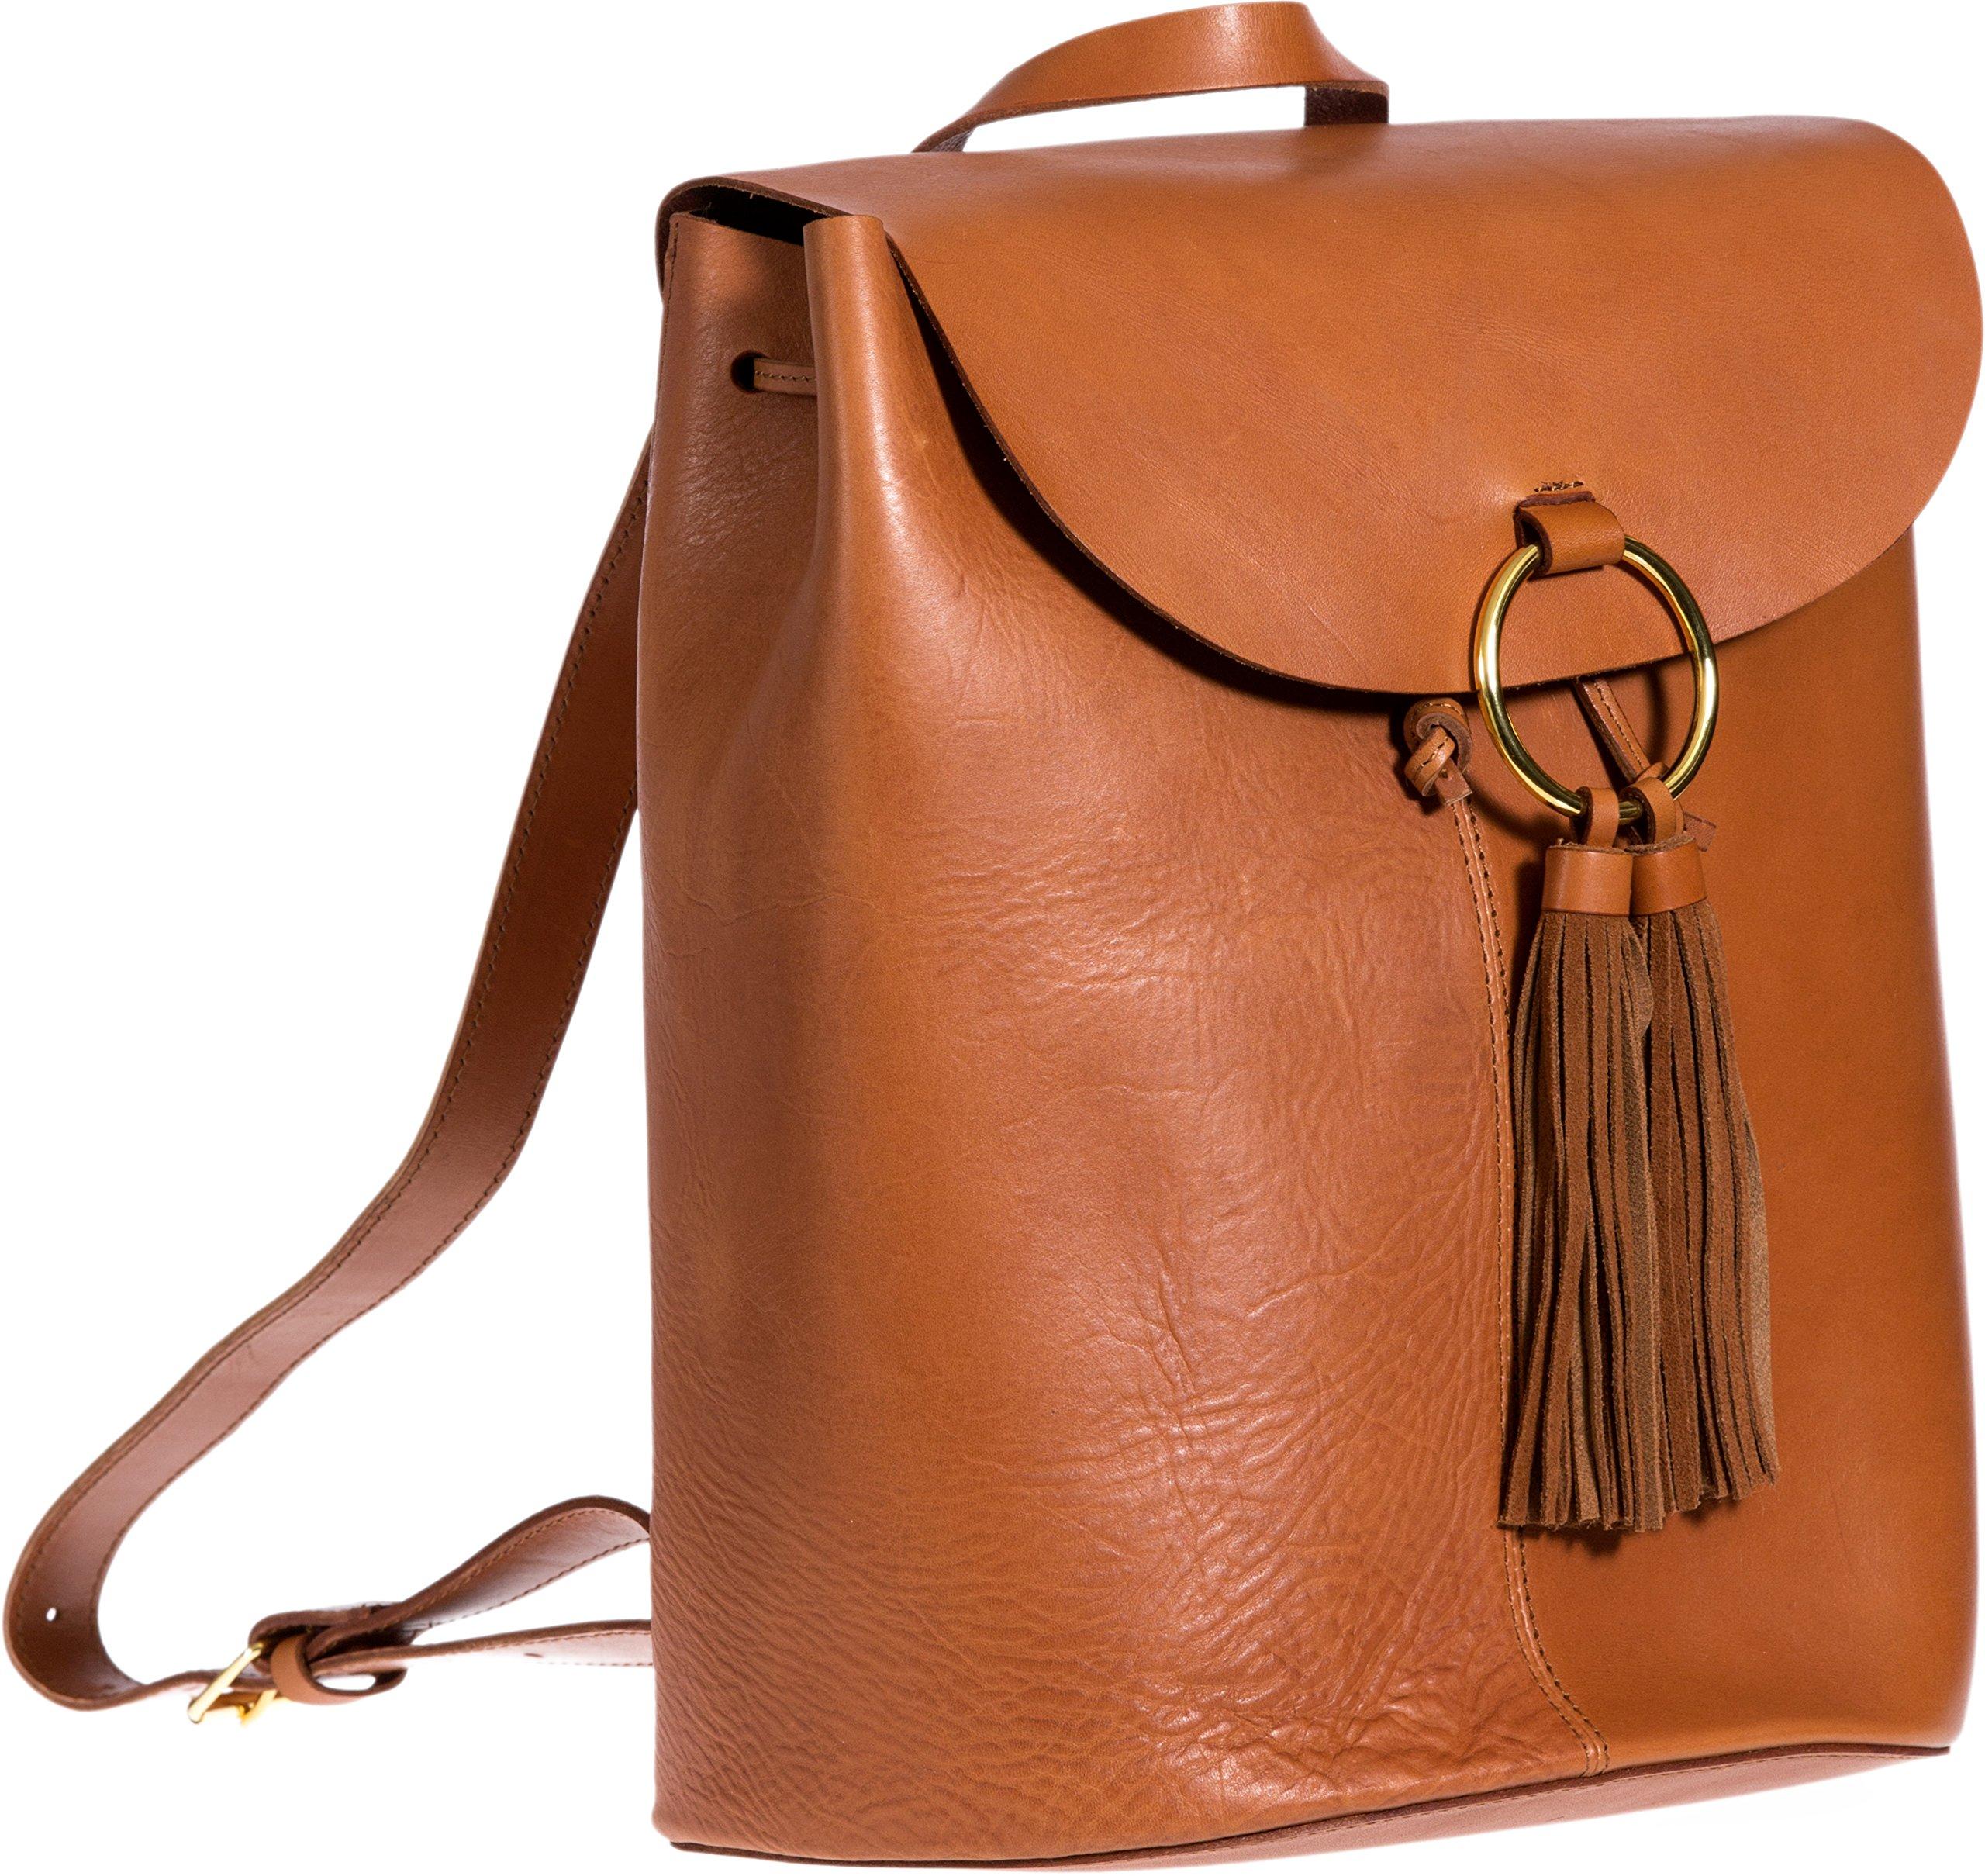 Horizon Argentine Leather Backpack Handbag